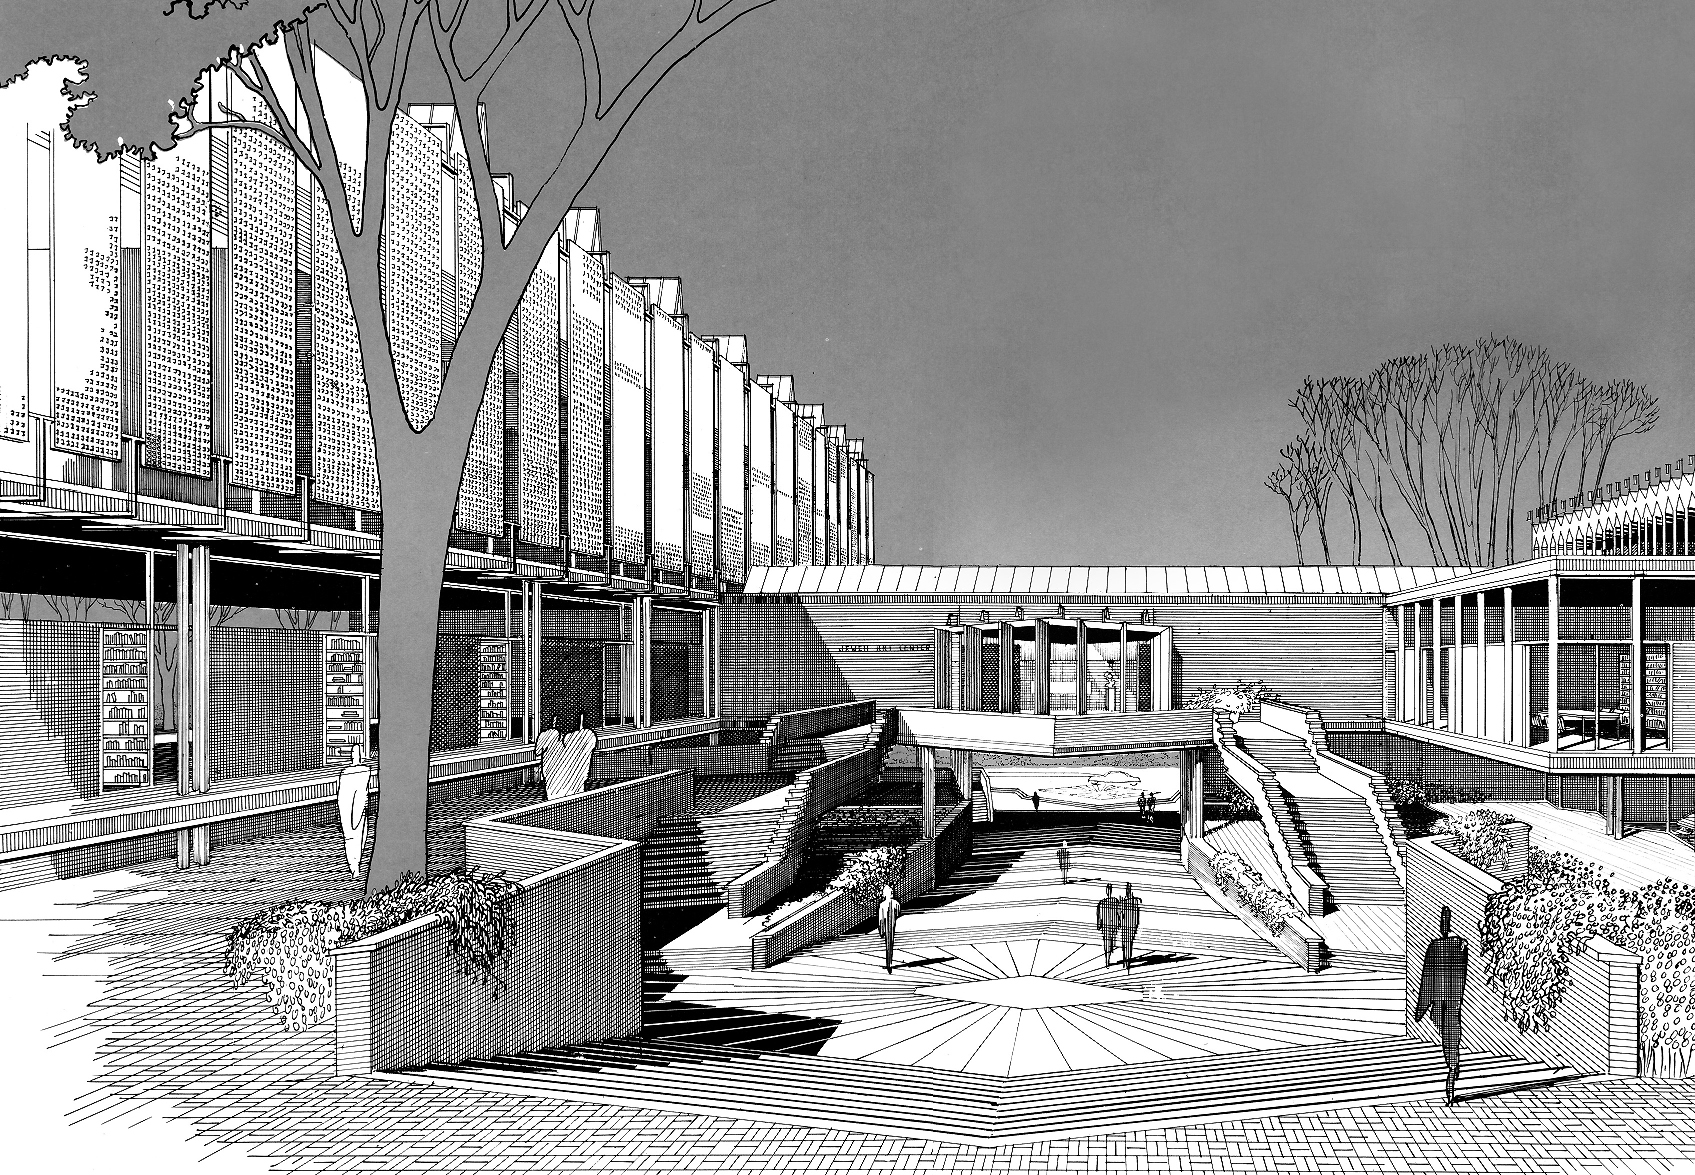 Jewett Arts Center for Wellesley College - 1955